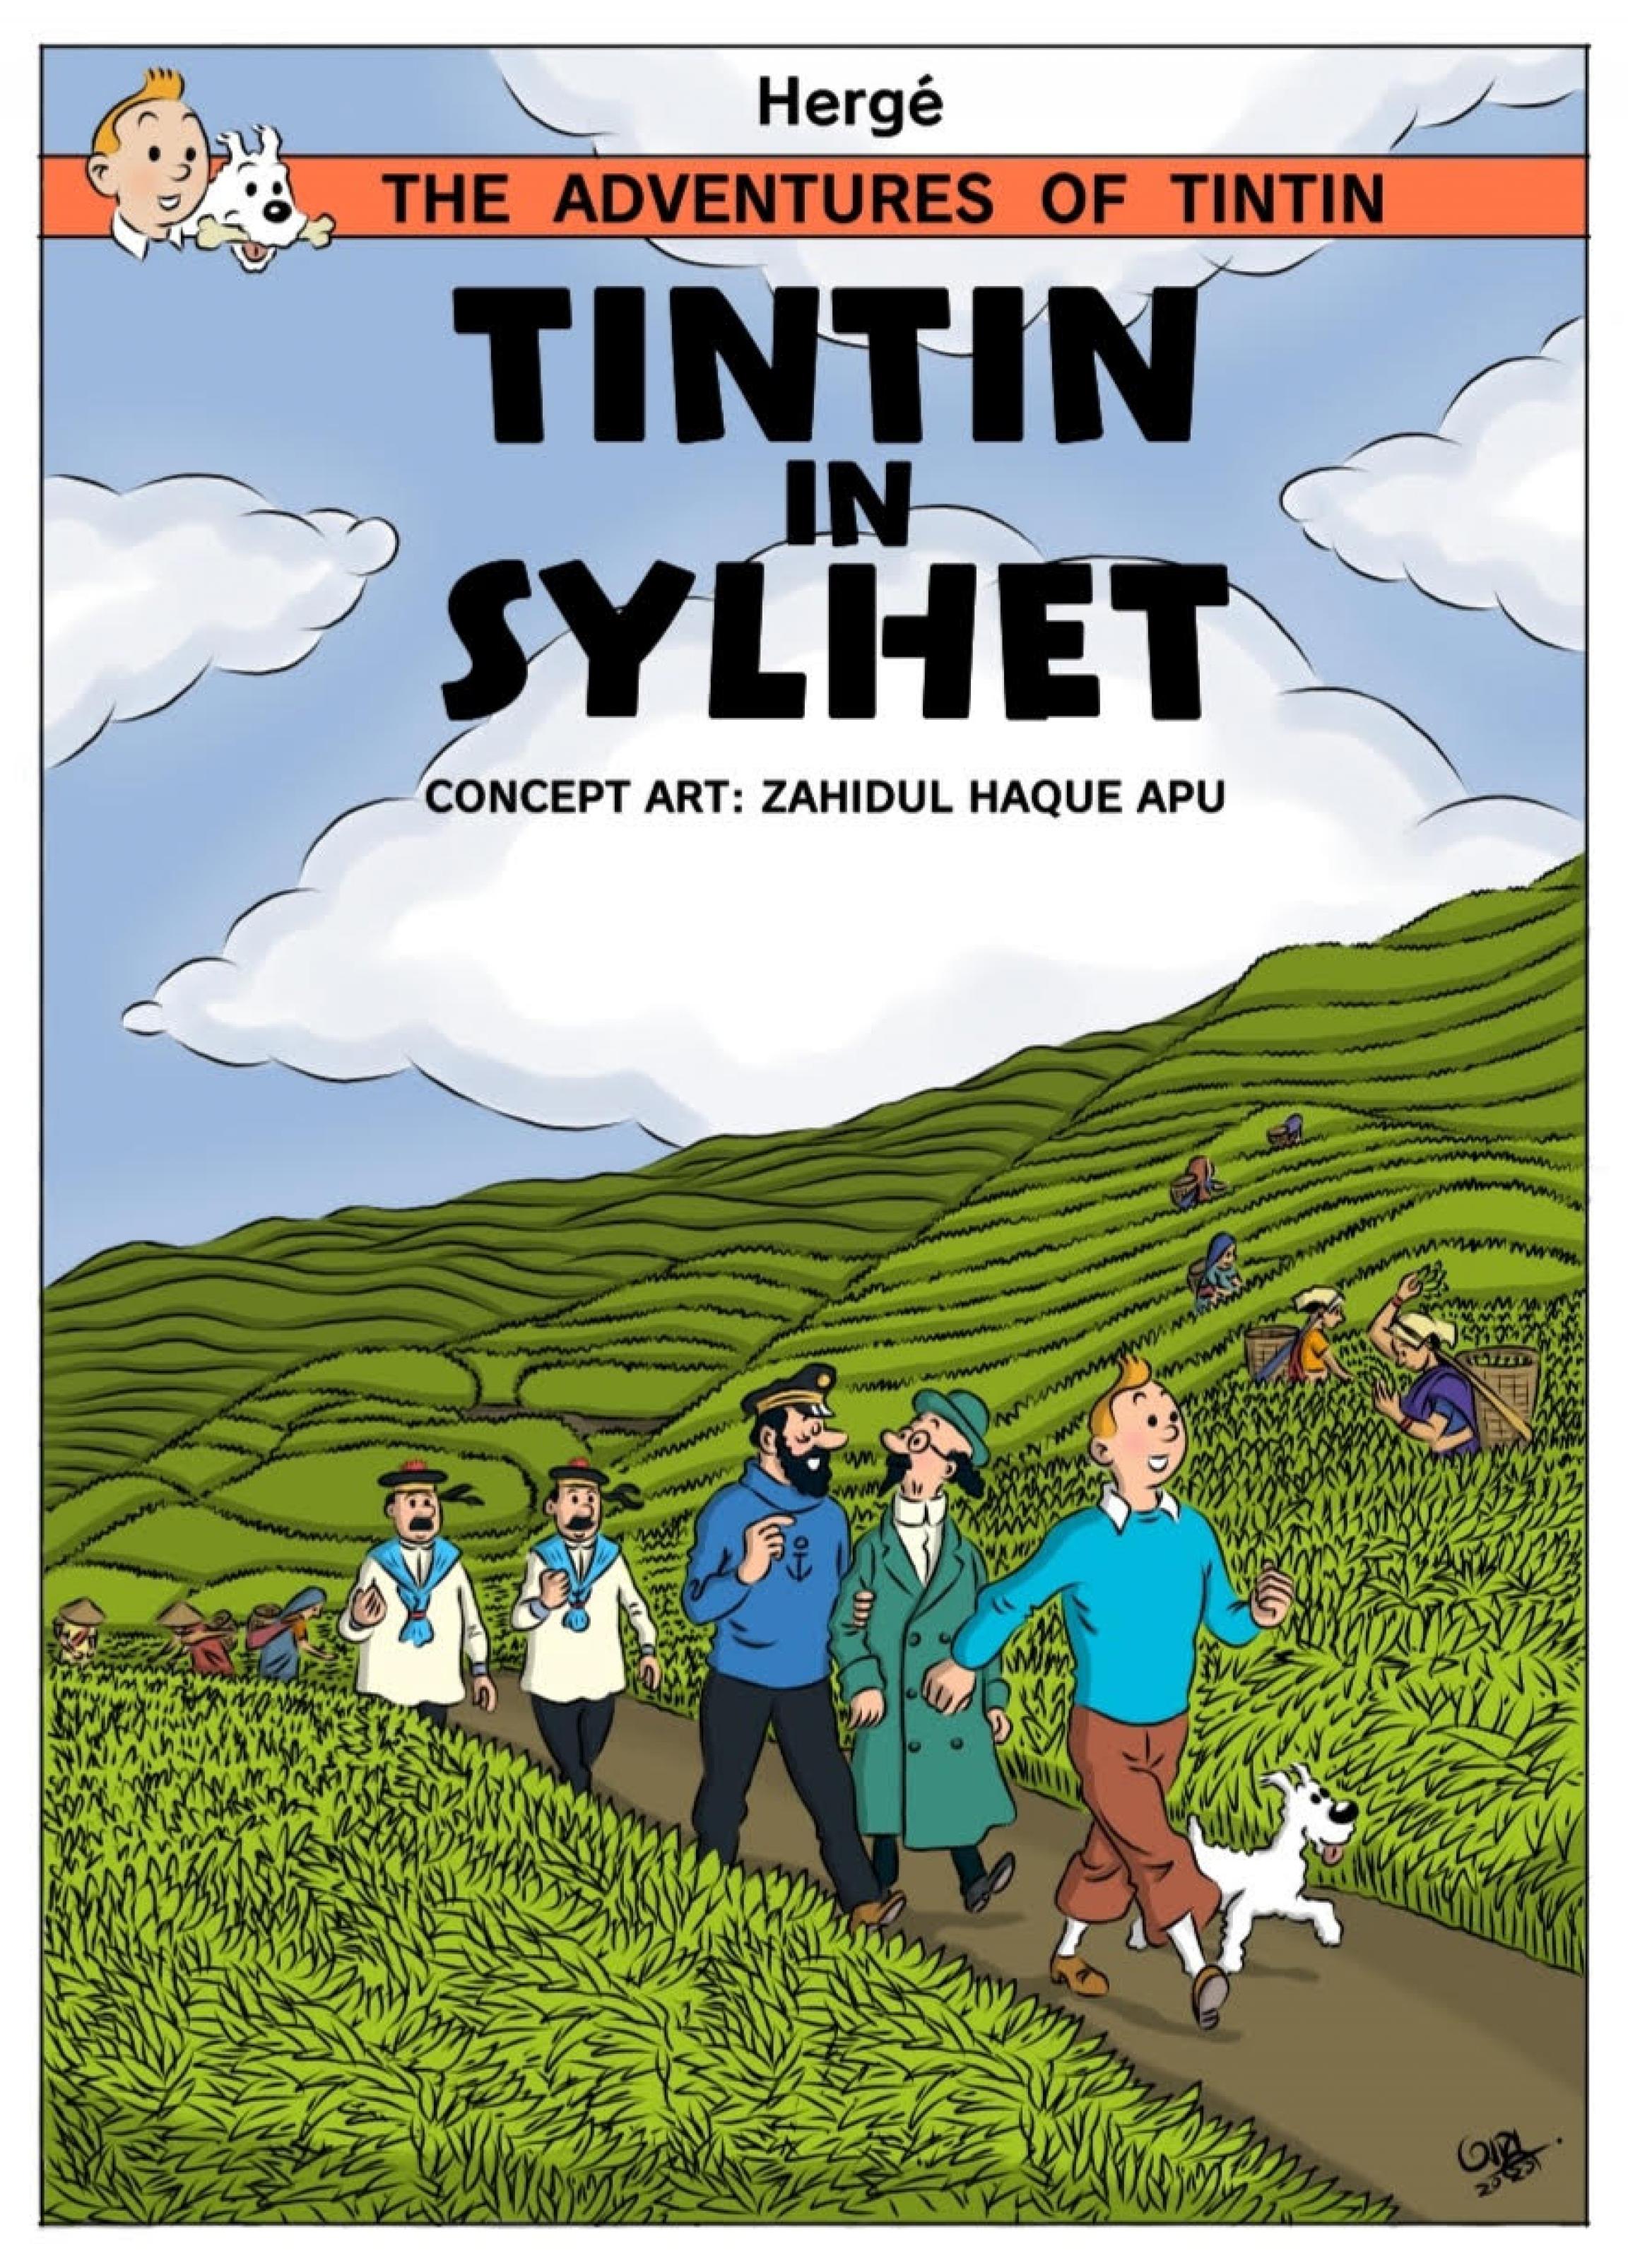 Cover art of character Tintin in Sylhet, Bangladesh